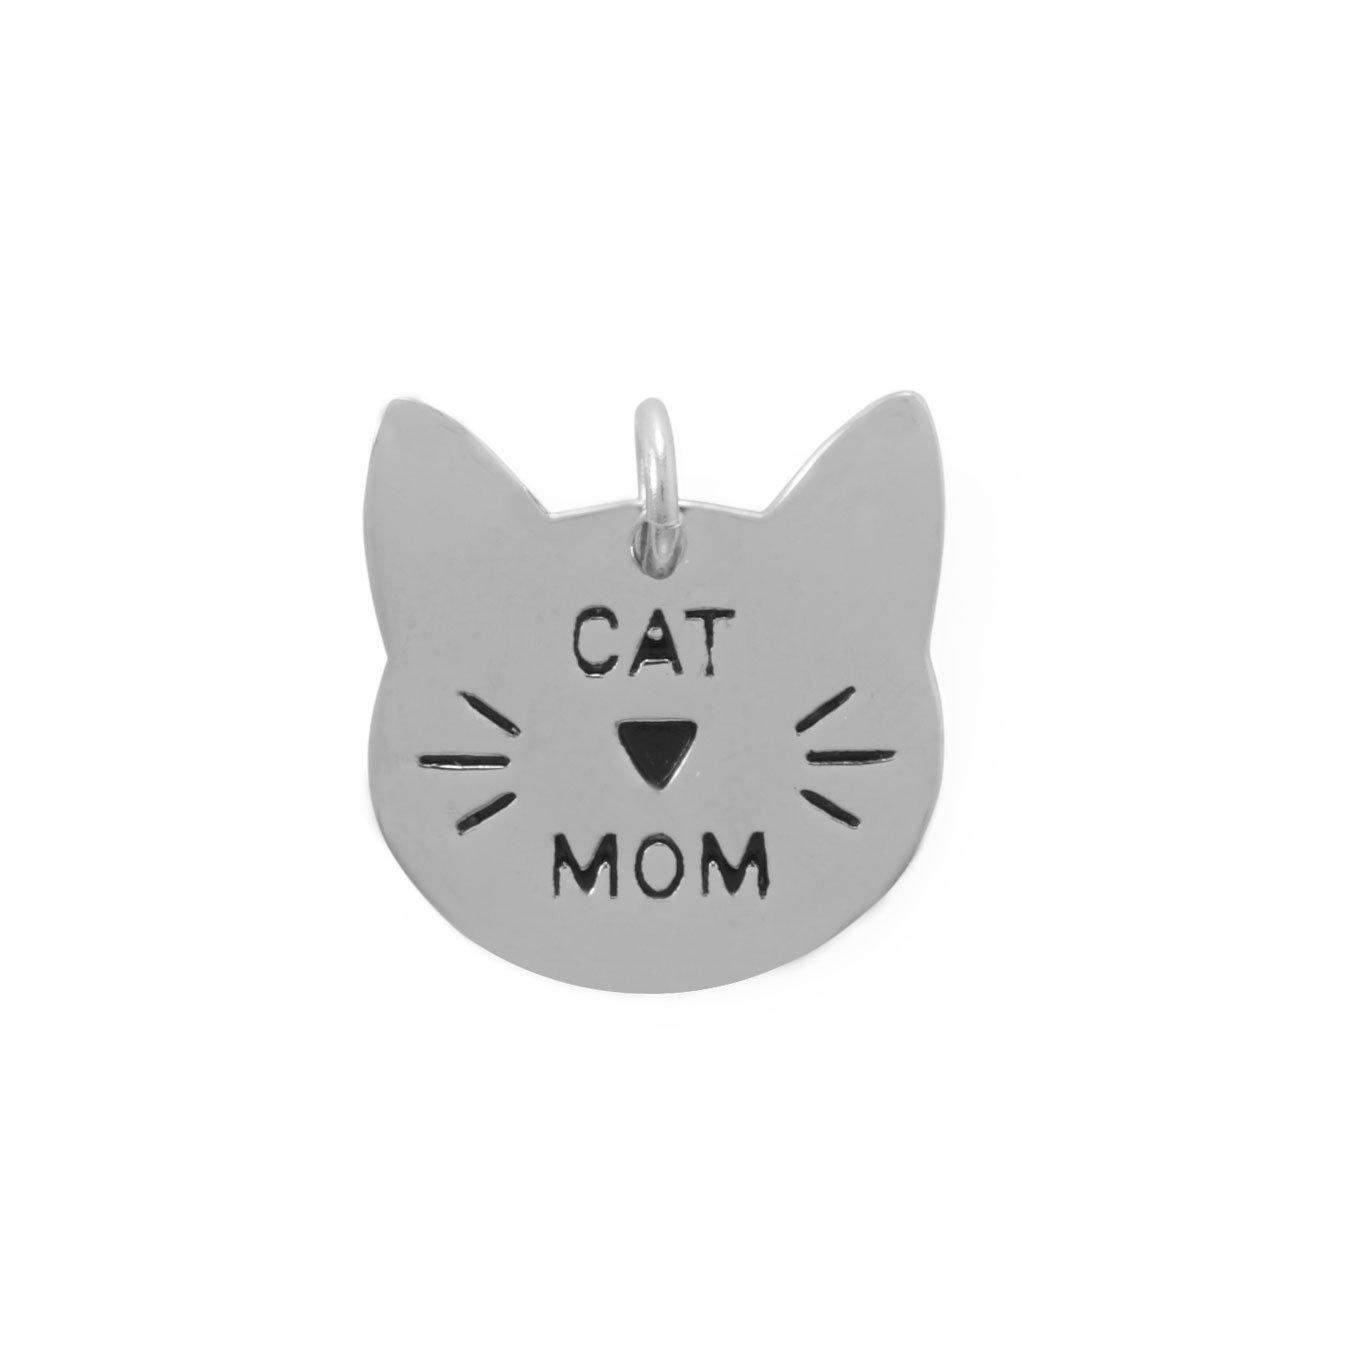 Rhodium Plated Cat Mom Charm